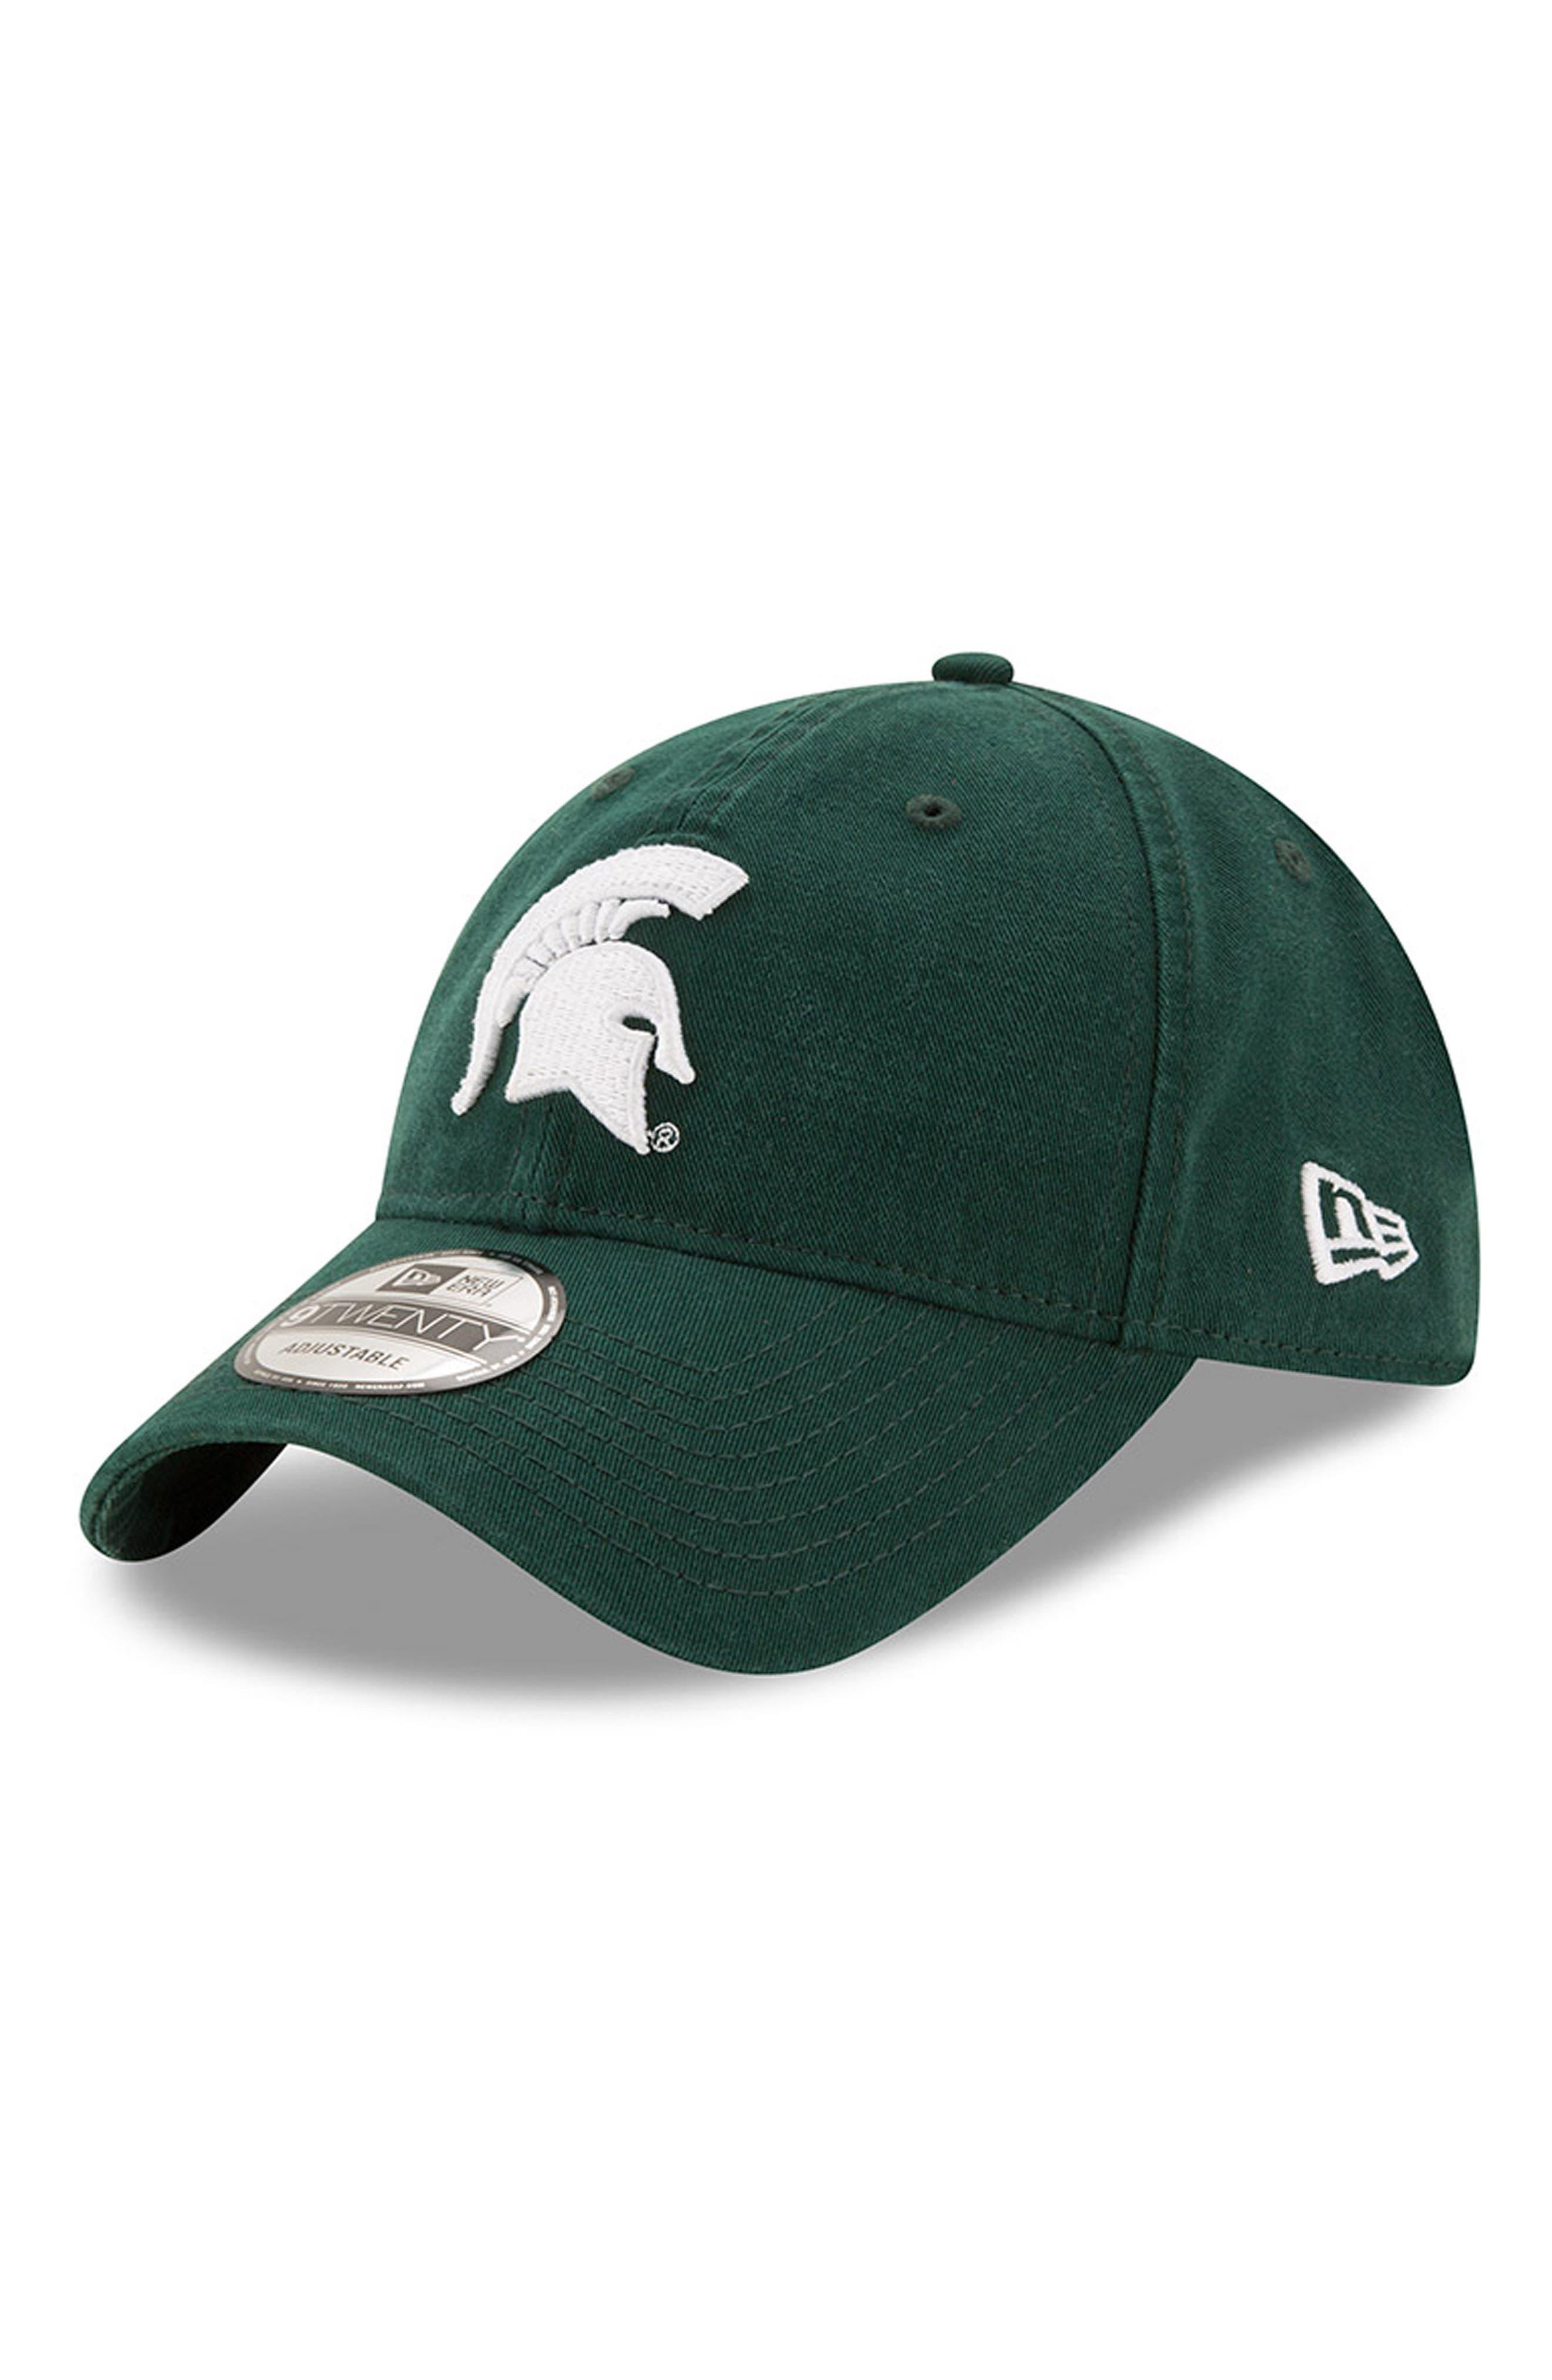 New Era Collegiate Core Classic - Michigan State Spartans Baseball Cap